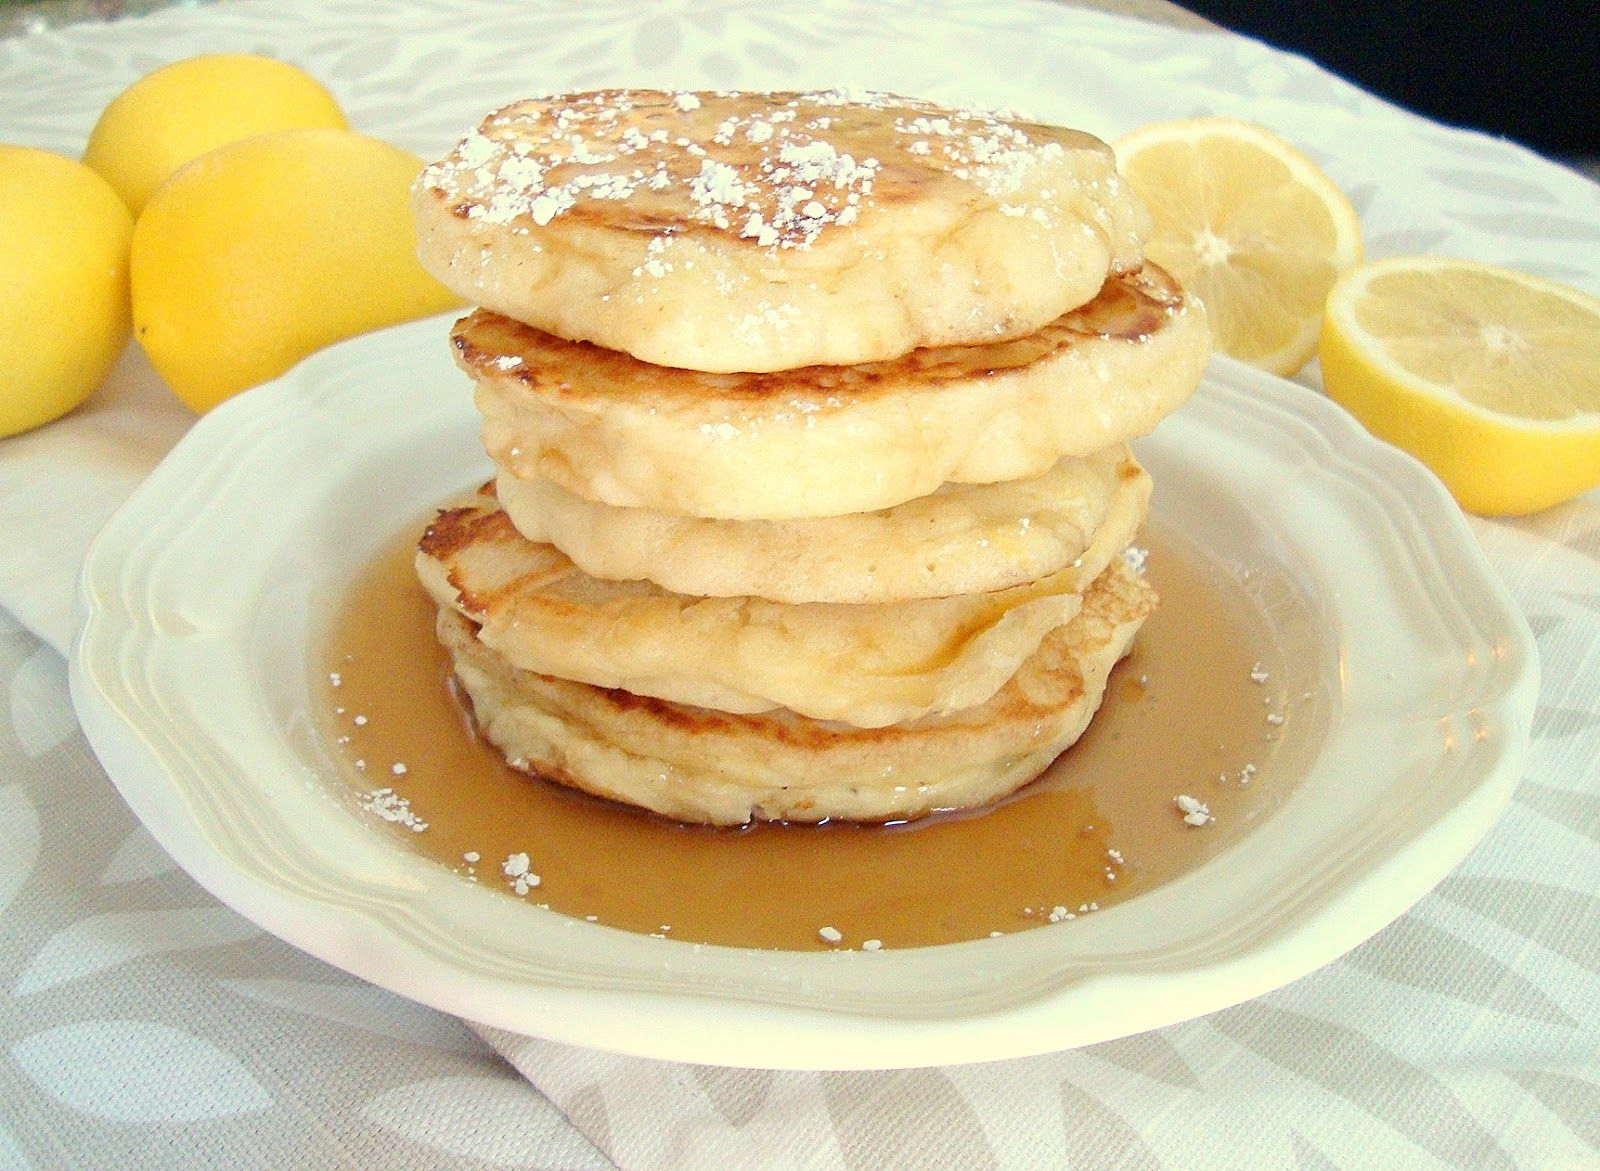 Chelseas culinary indulgence lemon souffle pancakes fun food chelseas culinary indulgence lemon souffle pancakes ccuart Choice Image